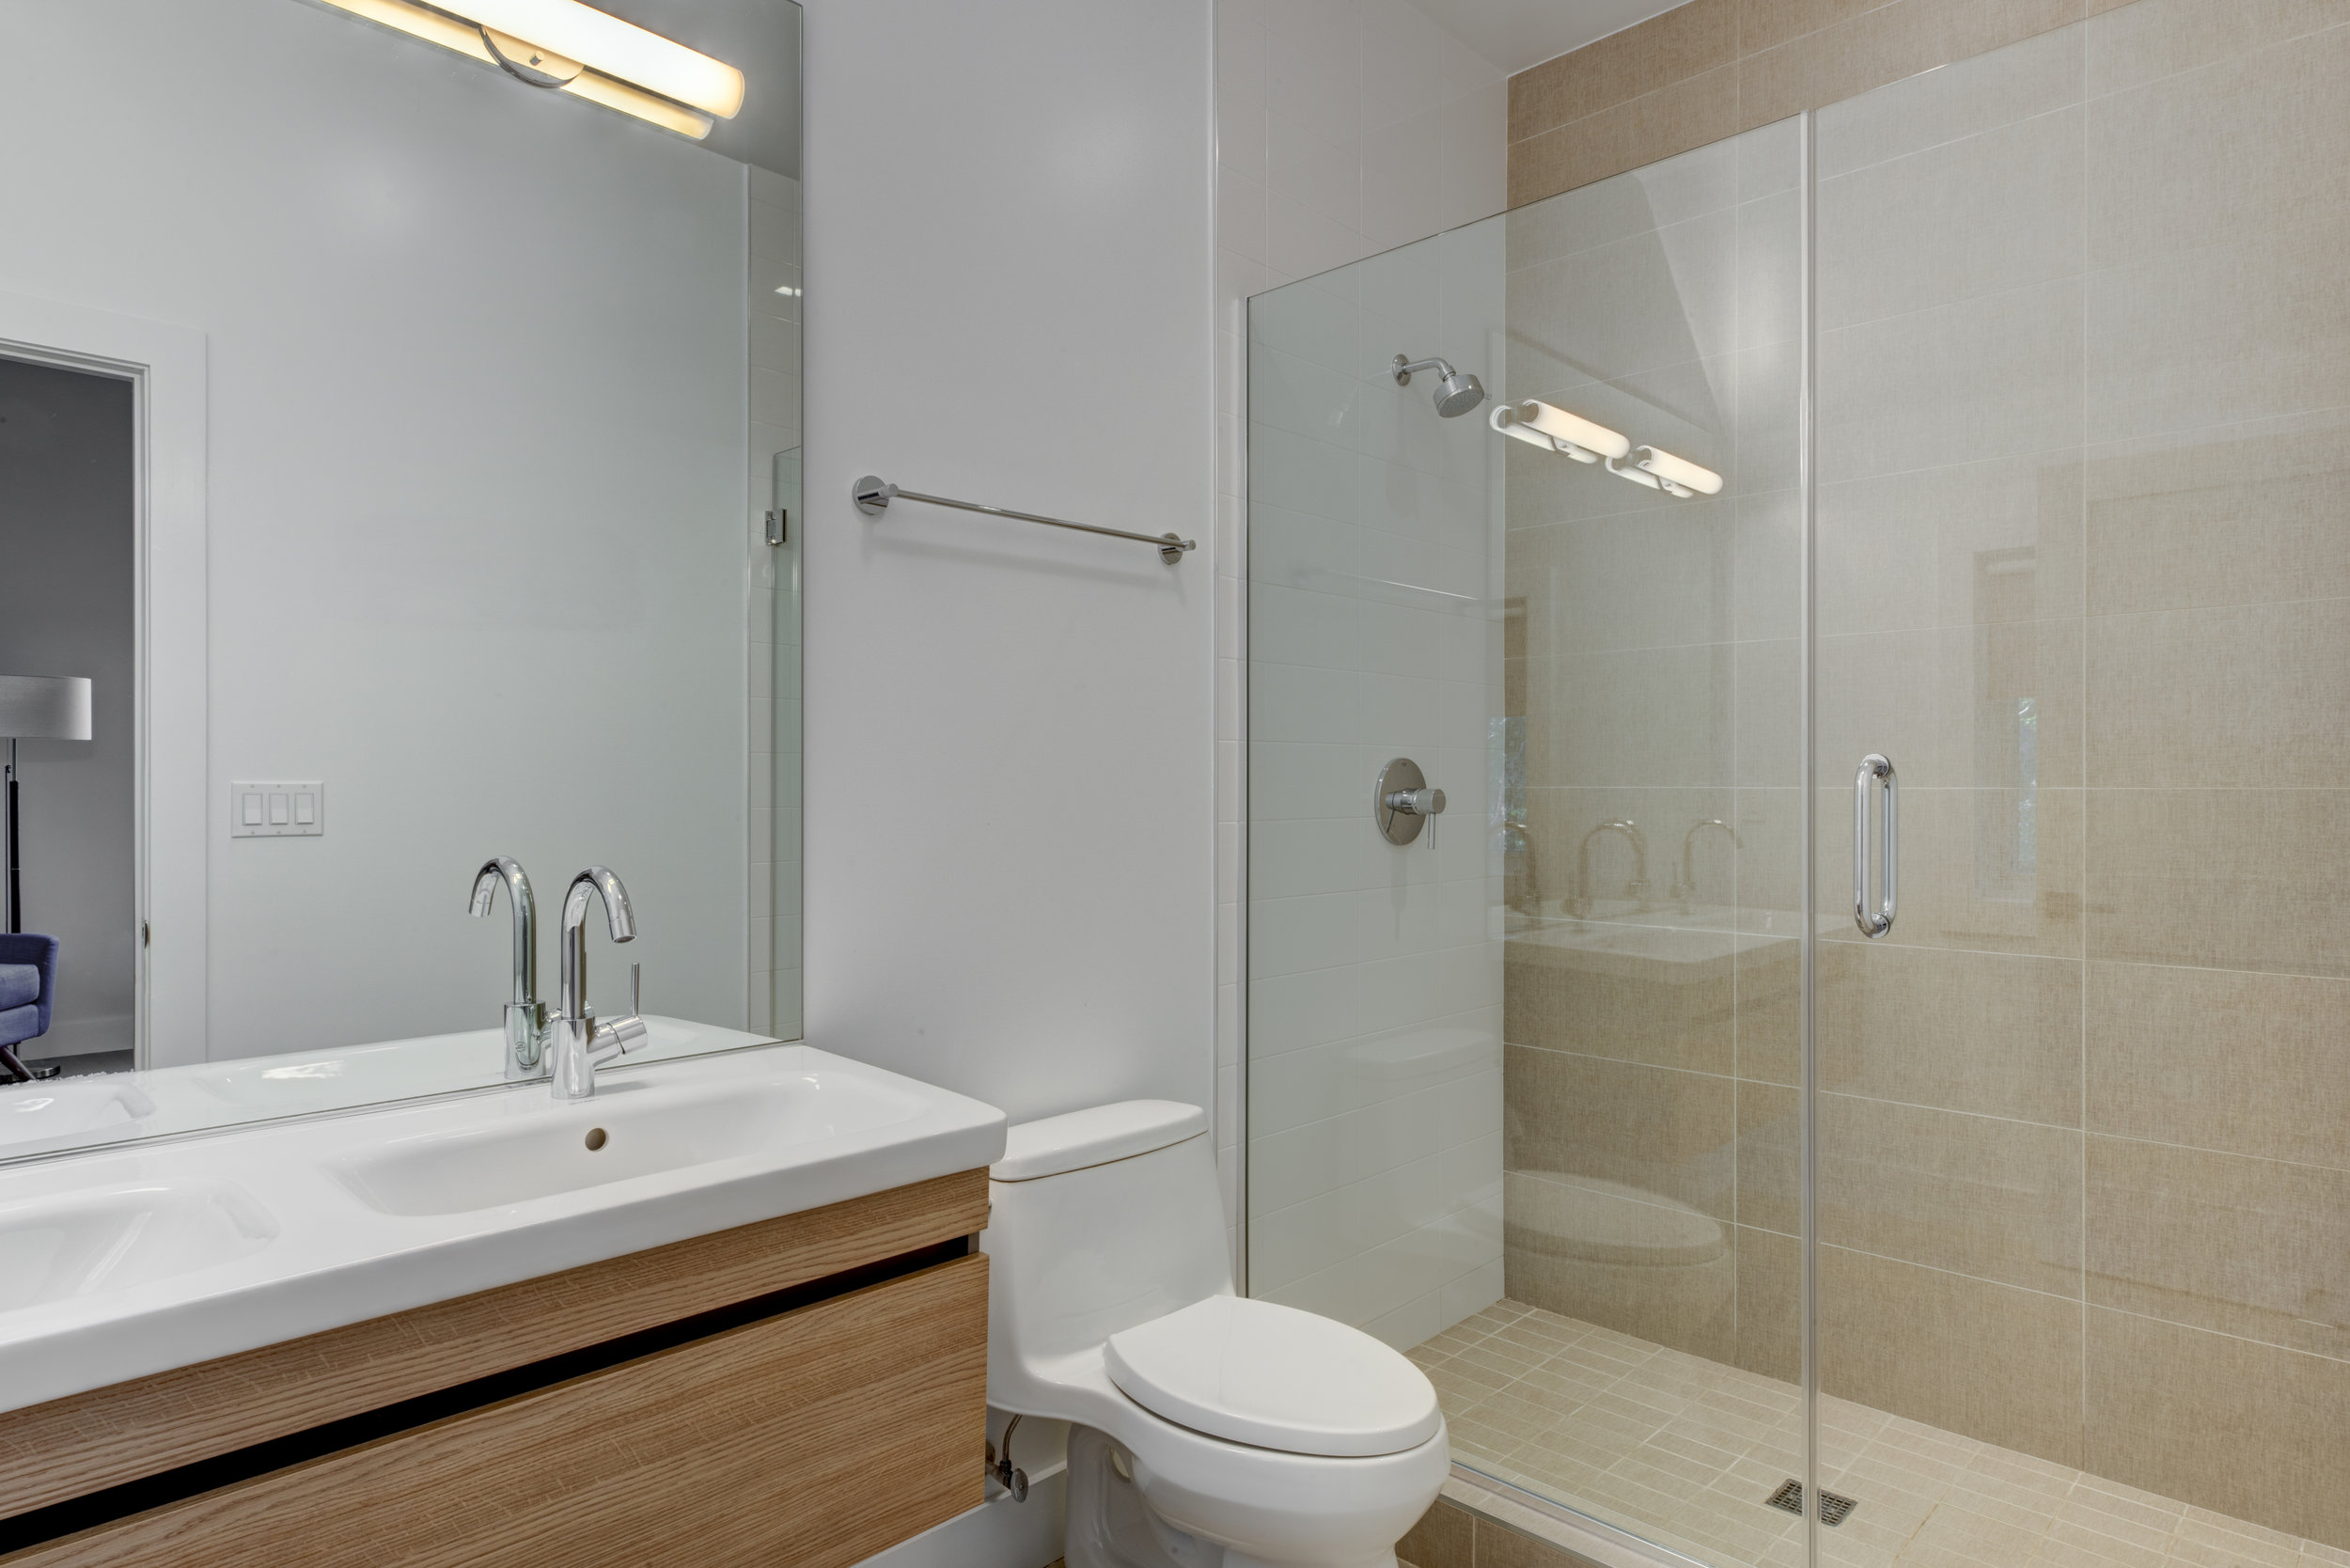 P Copy of 1 Cobblers Ct EH_Guest Bath.jpg